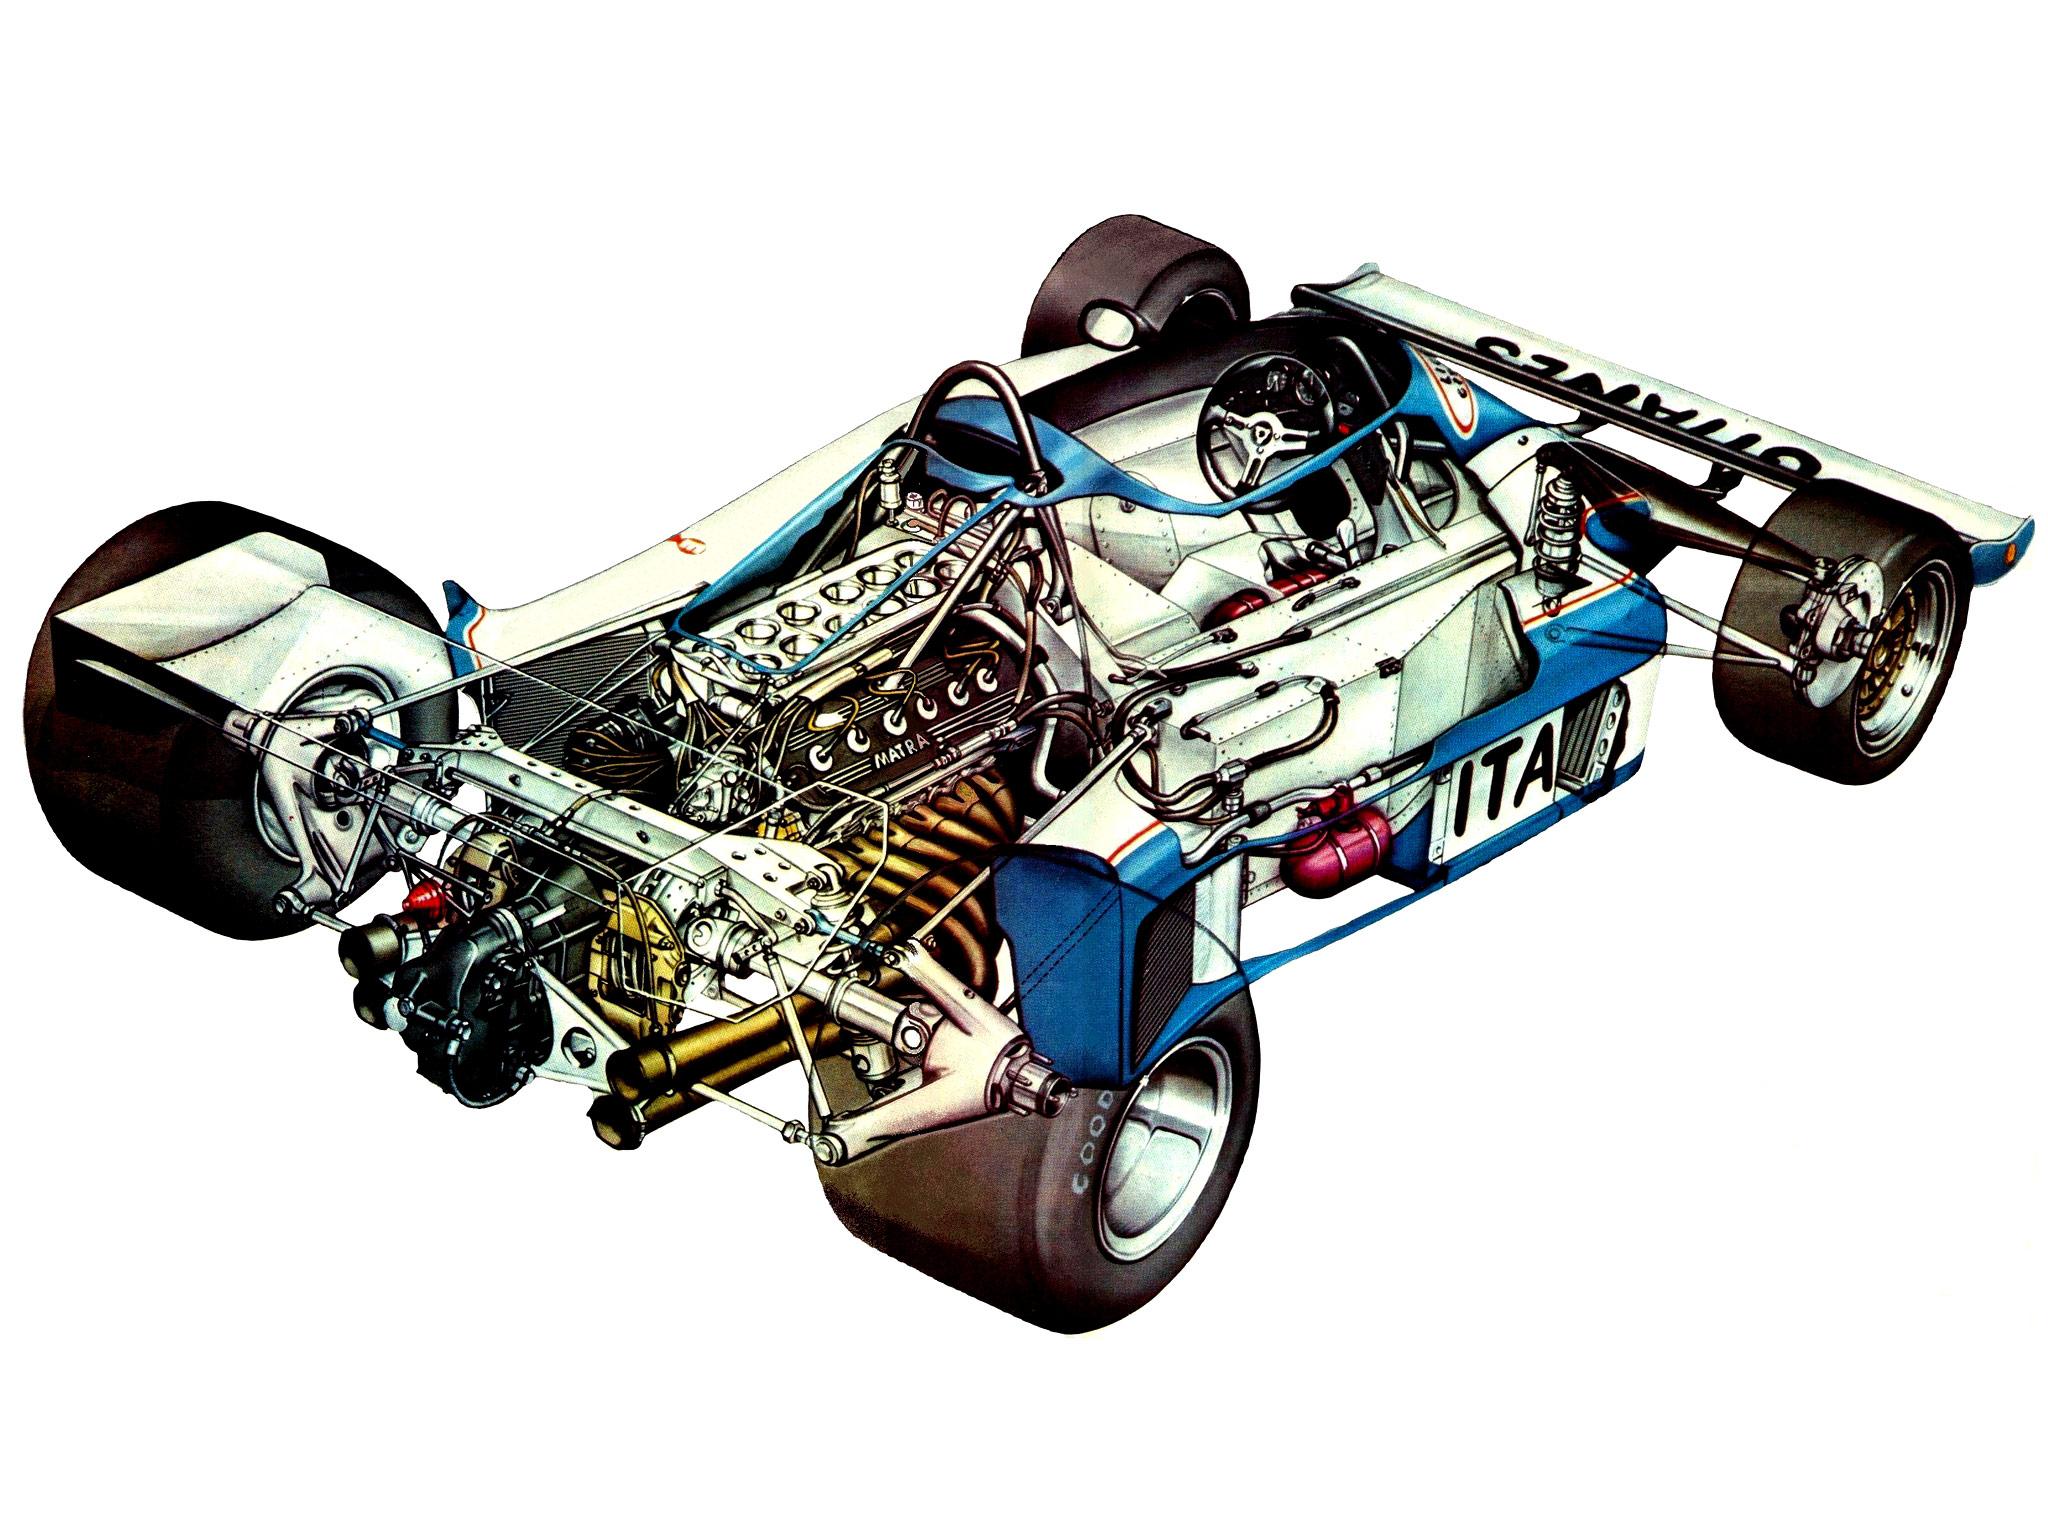 Ligier JS7 cutaway